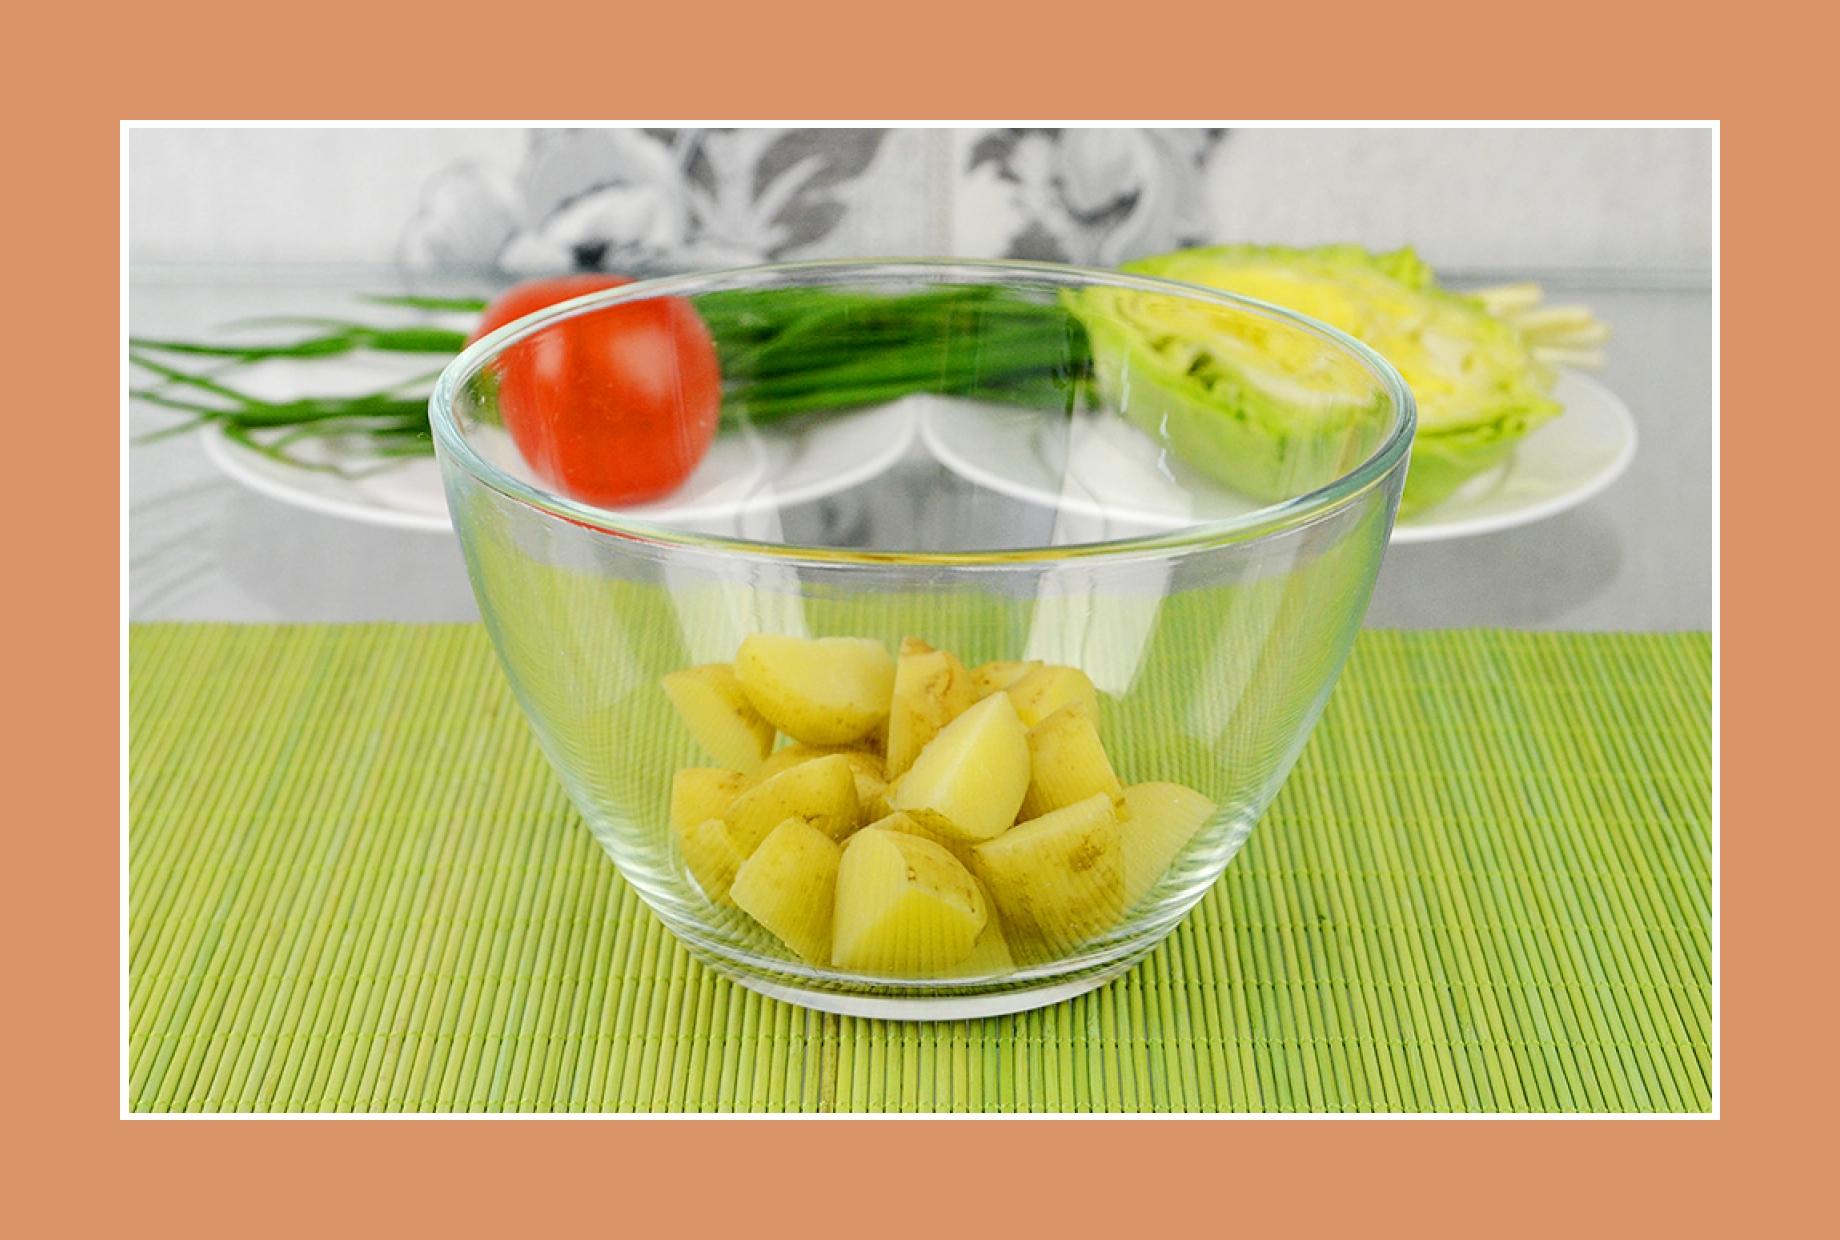 Kartoffelsalat Weißkrautsalat mit Frühkartoffeln